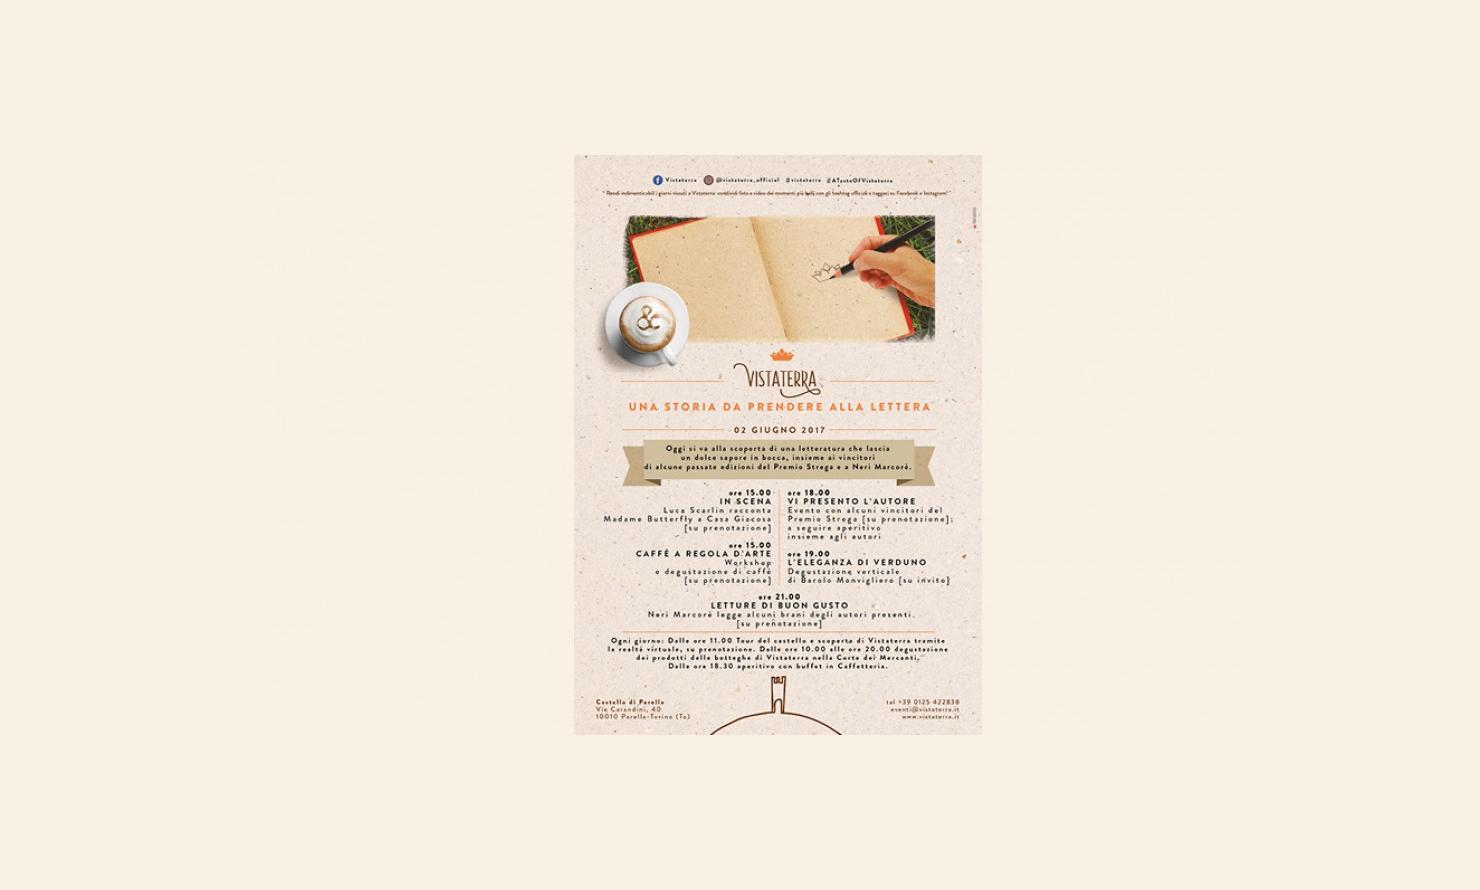 https://kubelibre.com/uploads/Slider-work-tutti-clienti/manital-vistaterra-comunicazione-integrata-4.jpg